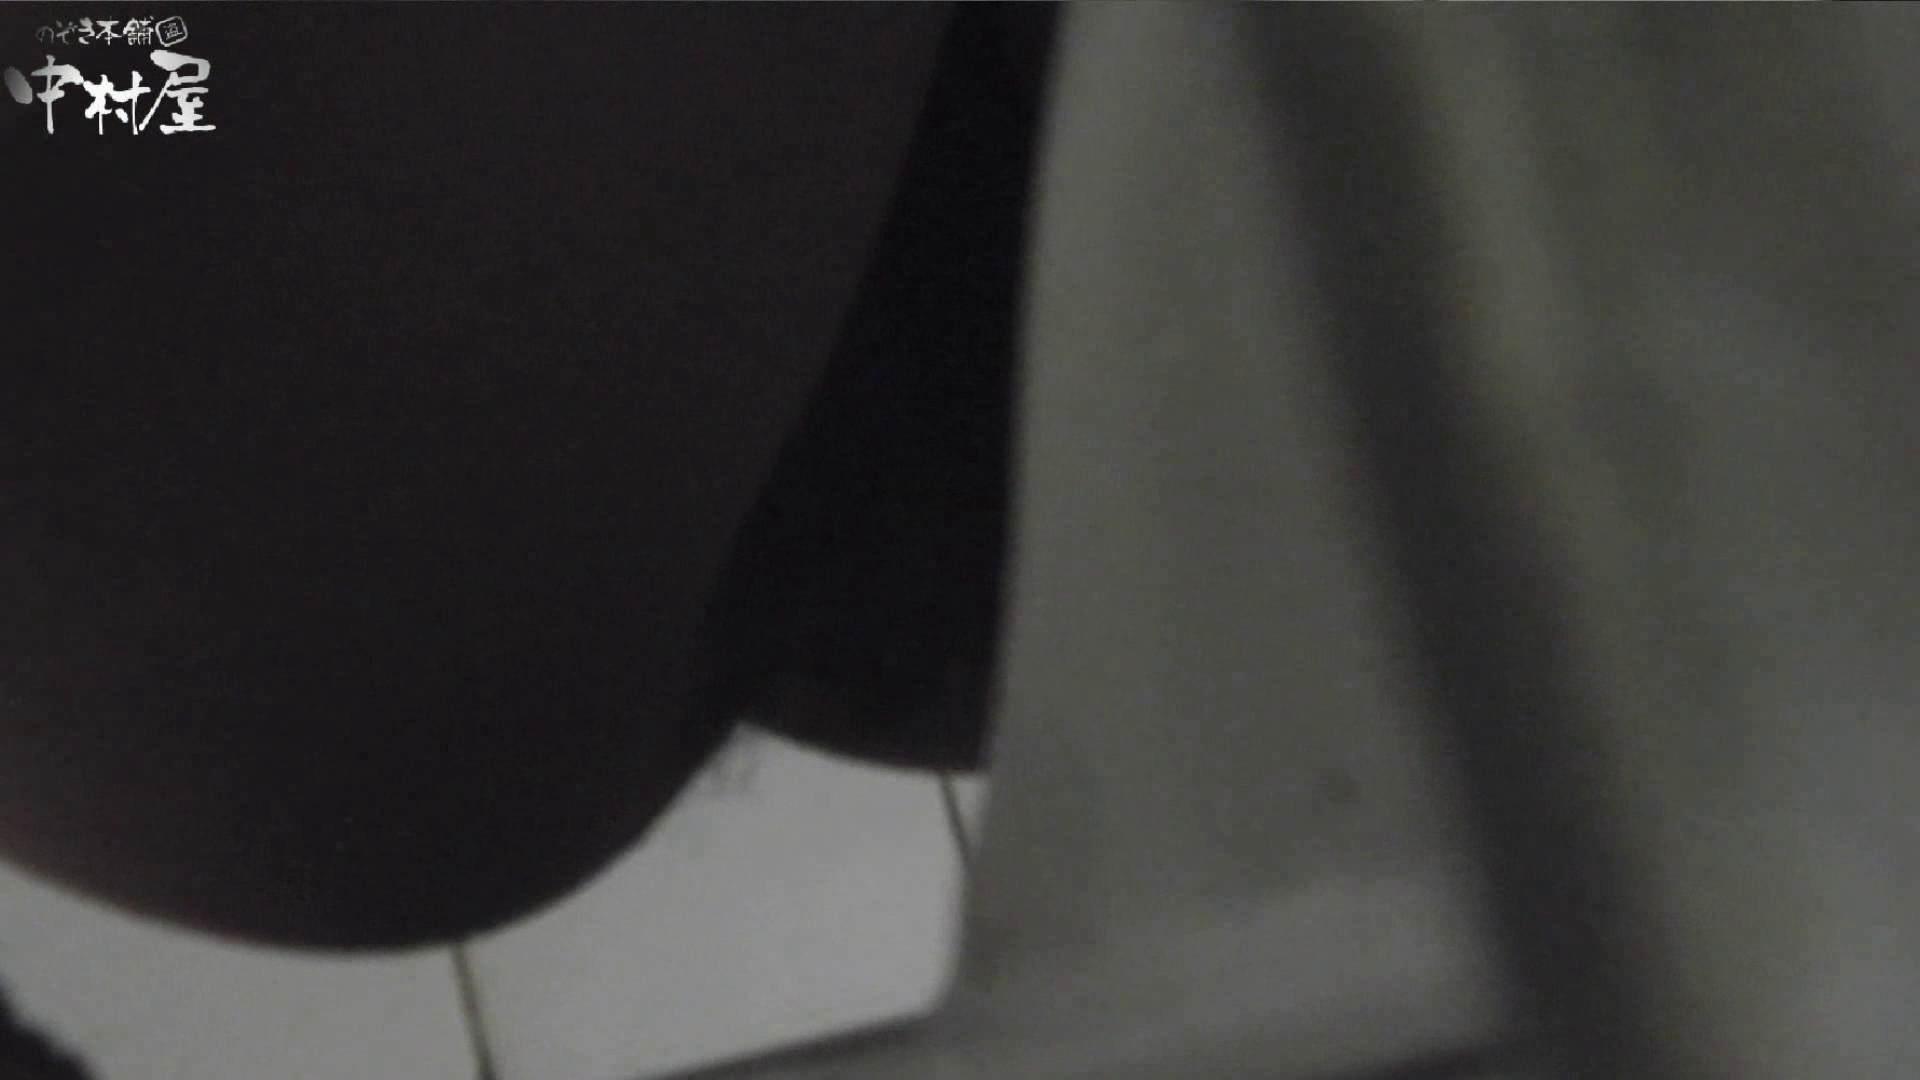 vol.42 命がけ潜伏洗面所! カカト上げながら・硬度強(太)・180g 0  79pic 42